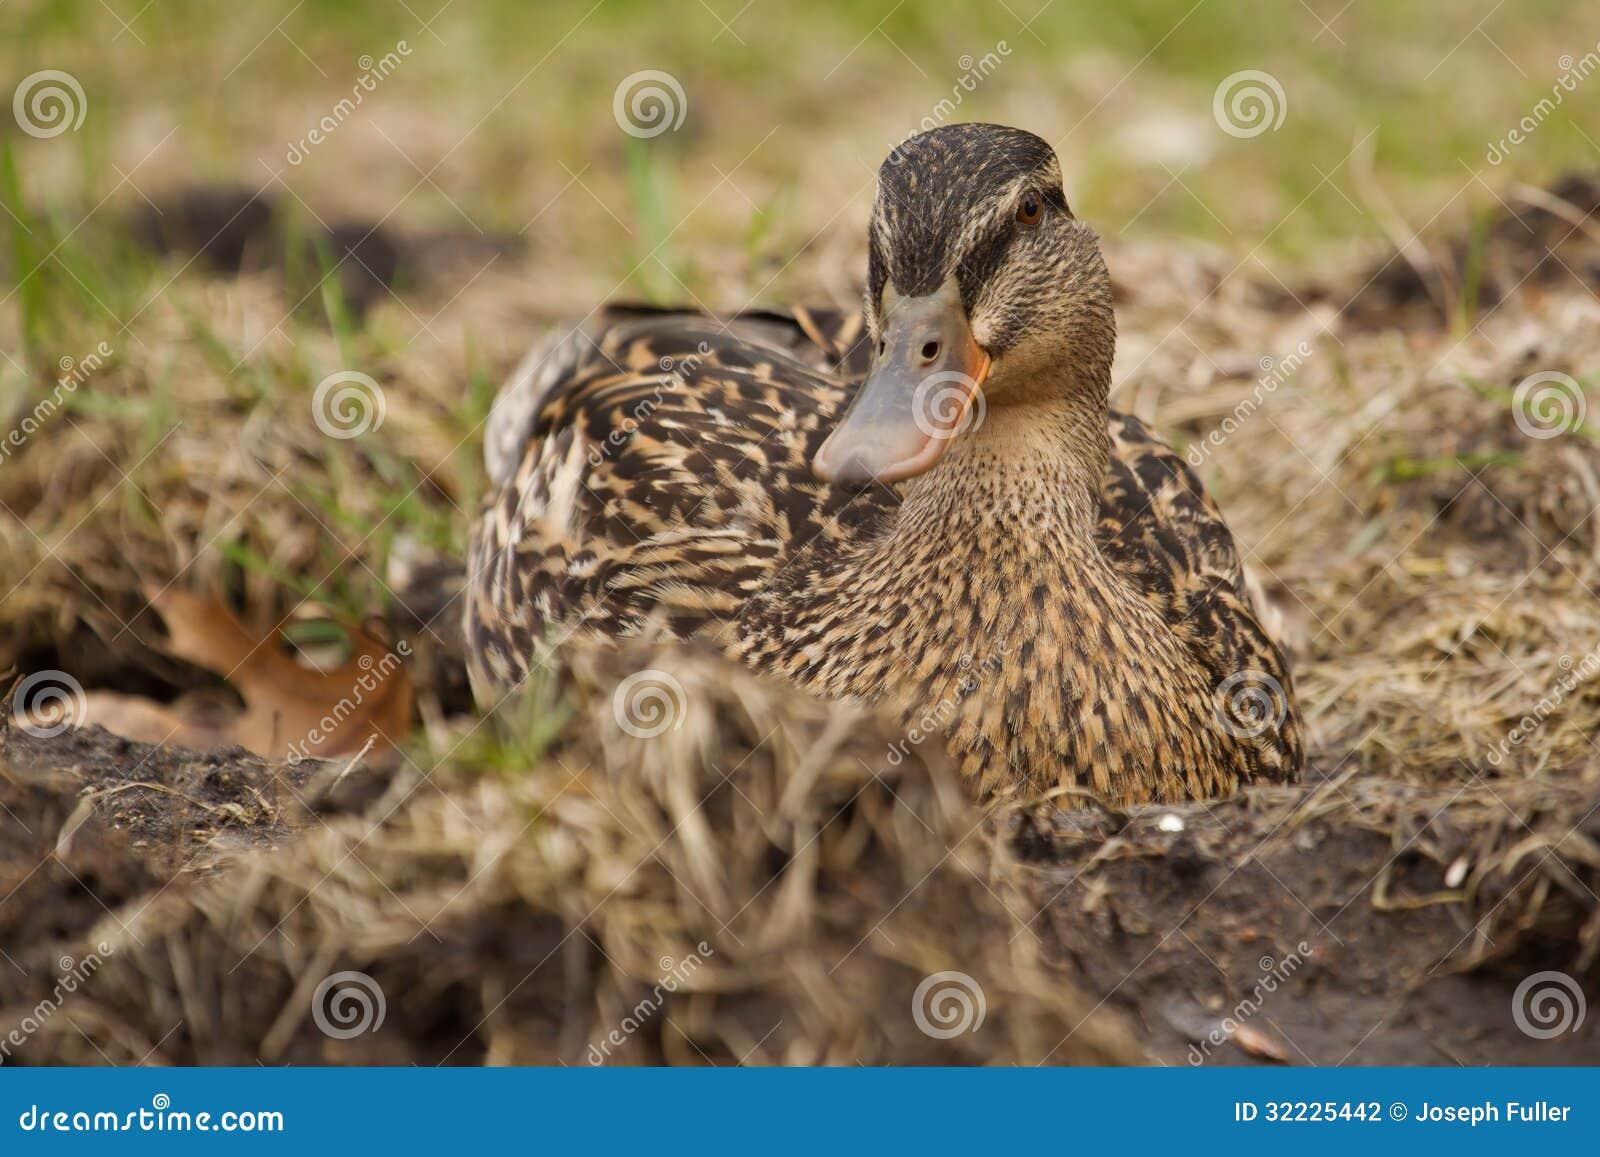 Download Pato selvagem na grama foto de stock. Imagem de cute - 32225442